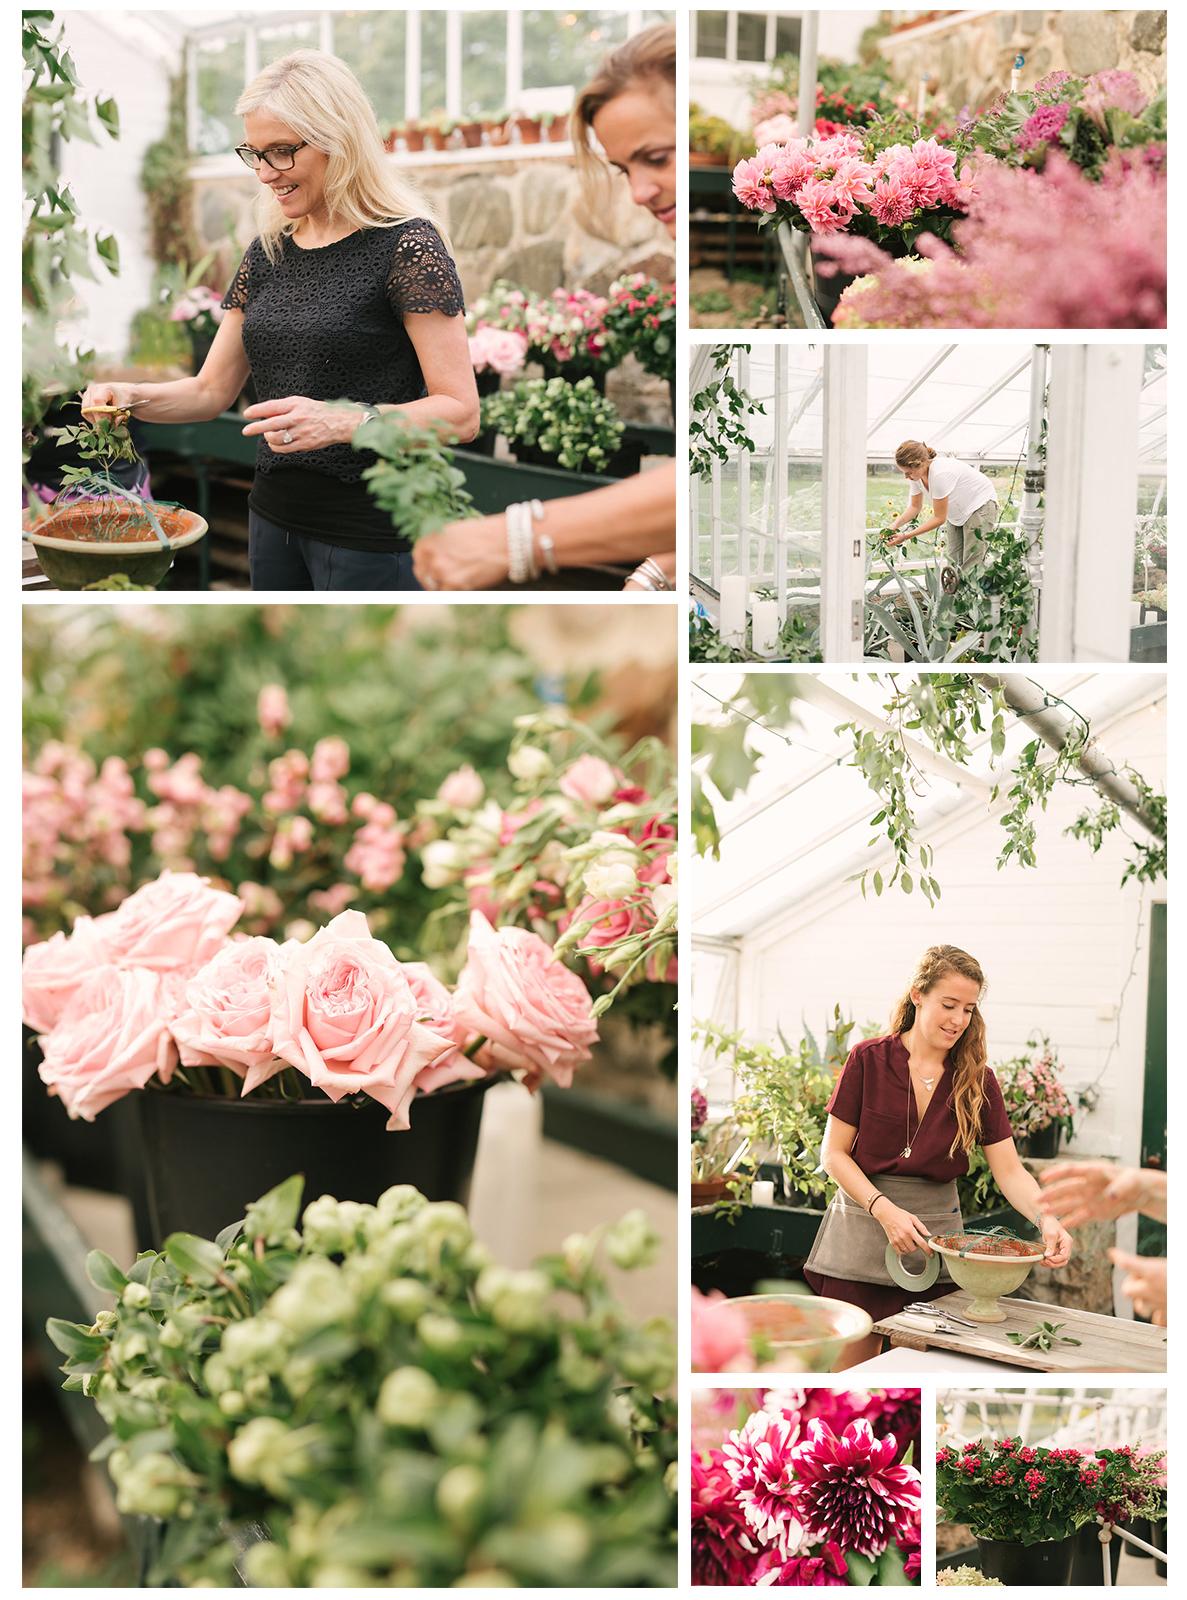 Les Fleurs floral design workshops in winter, spring, summer and fall